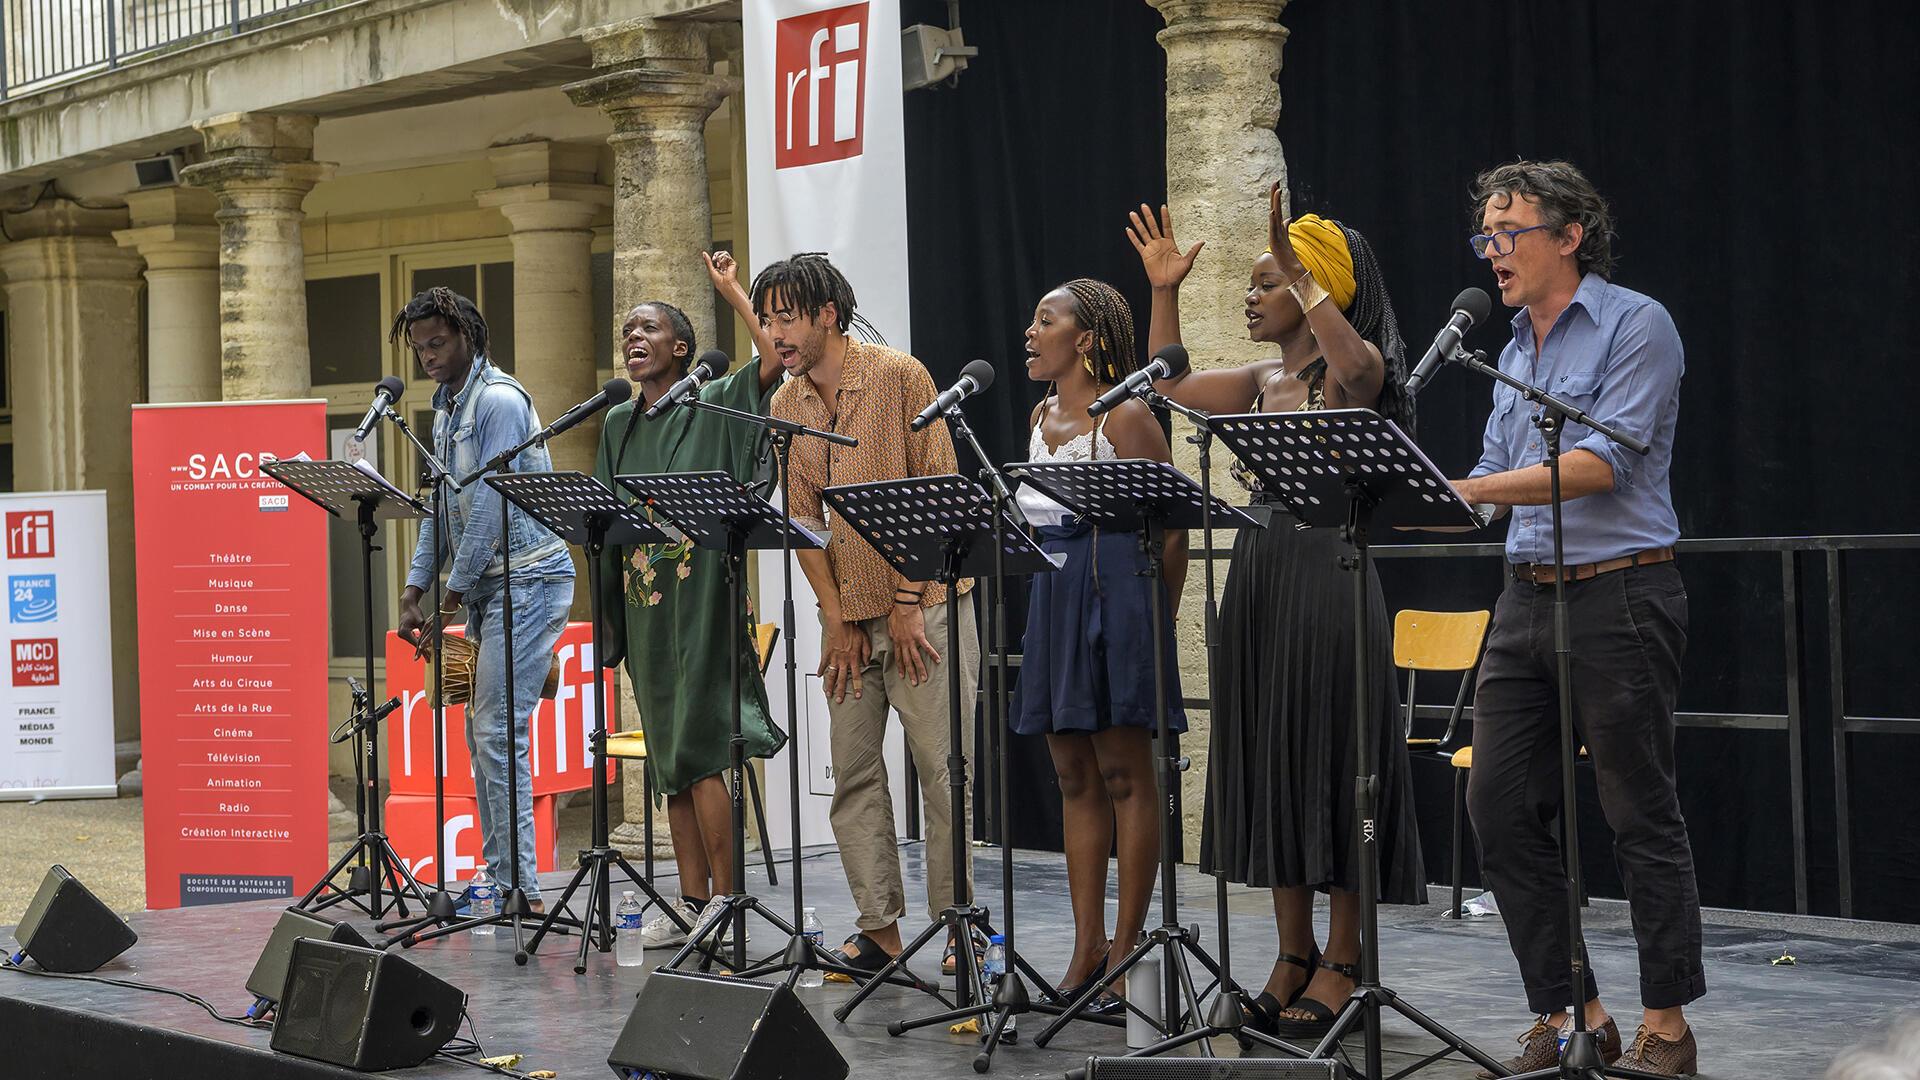 The actors Ibrahima Diokine Sambou, Sophie Senecaut, Tom Adjibi, Aminata Abdoulaye, Babetida Sadjo, Vincent Minne, during the readings of